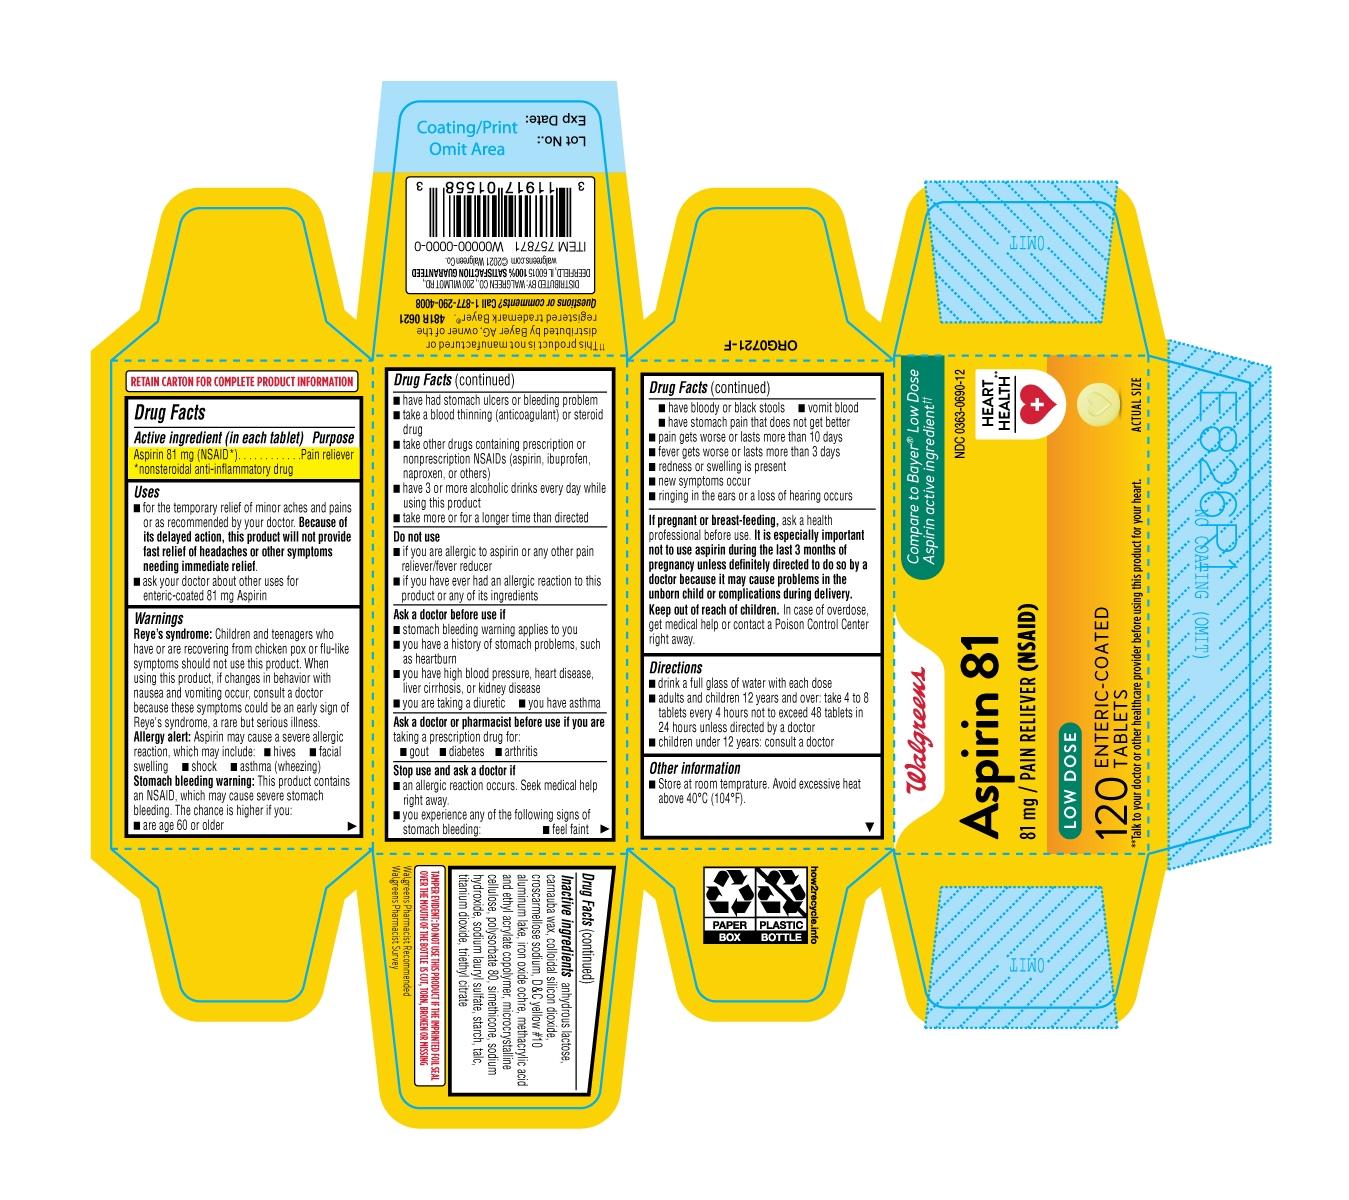 481R-Walgreens-Low Dose Aspirin-carton label-ct120